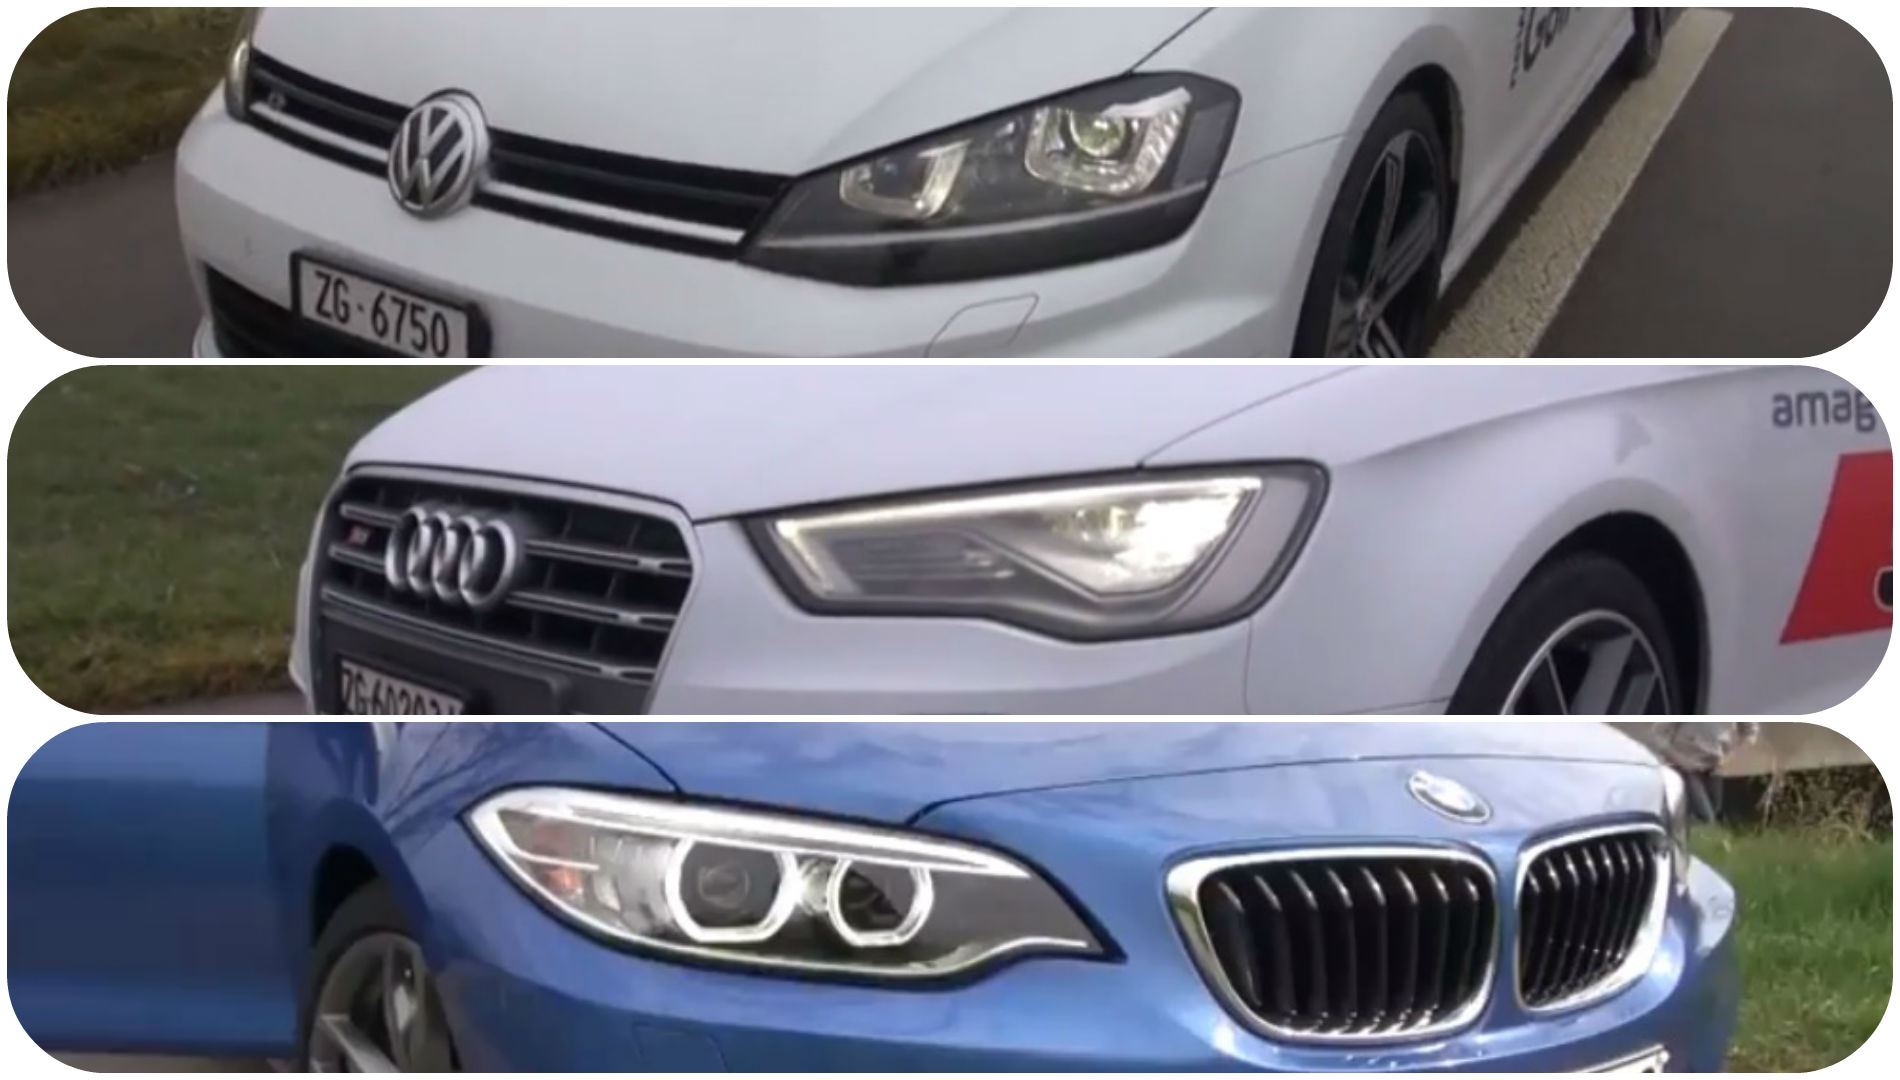 audi s3 vs golf 7 r vs bmw m235i the 300 hp comparison autoevolution. Black Bedroom Furniture Sets. Home Design Ideas